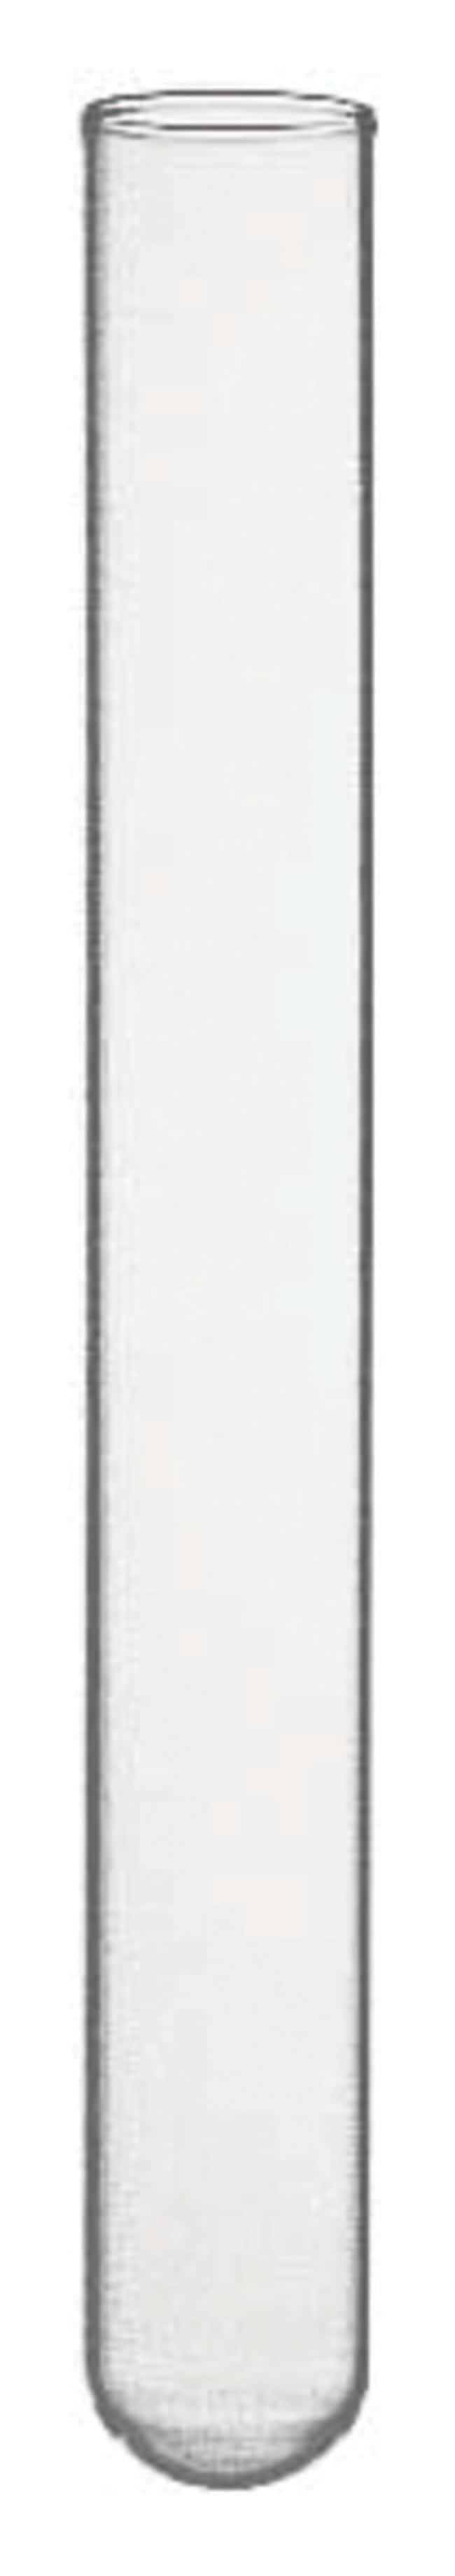 Fisherbrand™Randloses Reagenzglas aus Borosilikatglas mit mittlerer Wandstärke Abmessungen: 16 Durchmesserx 150mmHöhe Fisherbrand™Randloses Reagenzglas aus Borosilikatglas mit mittlerer Wandstärke